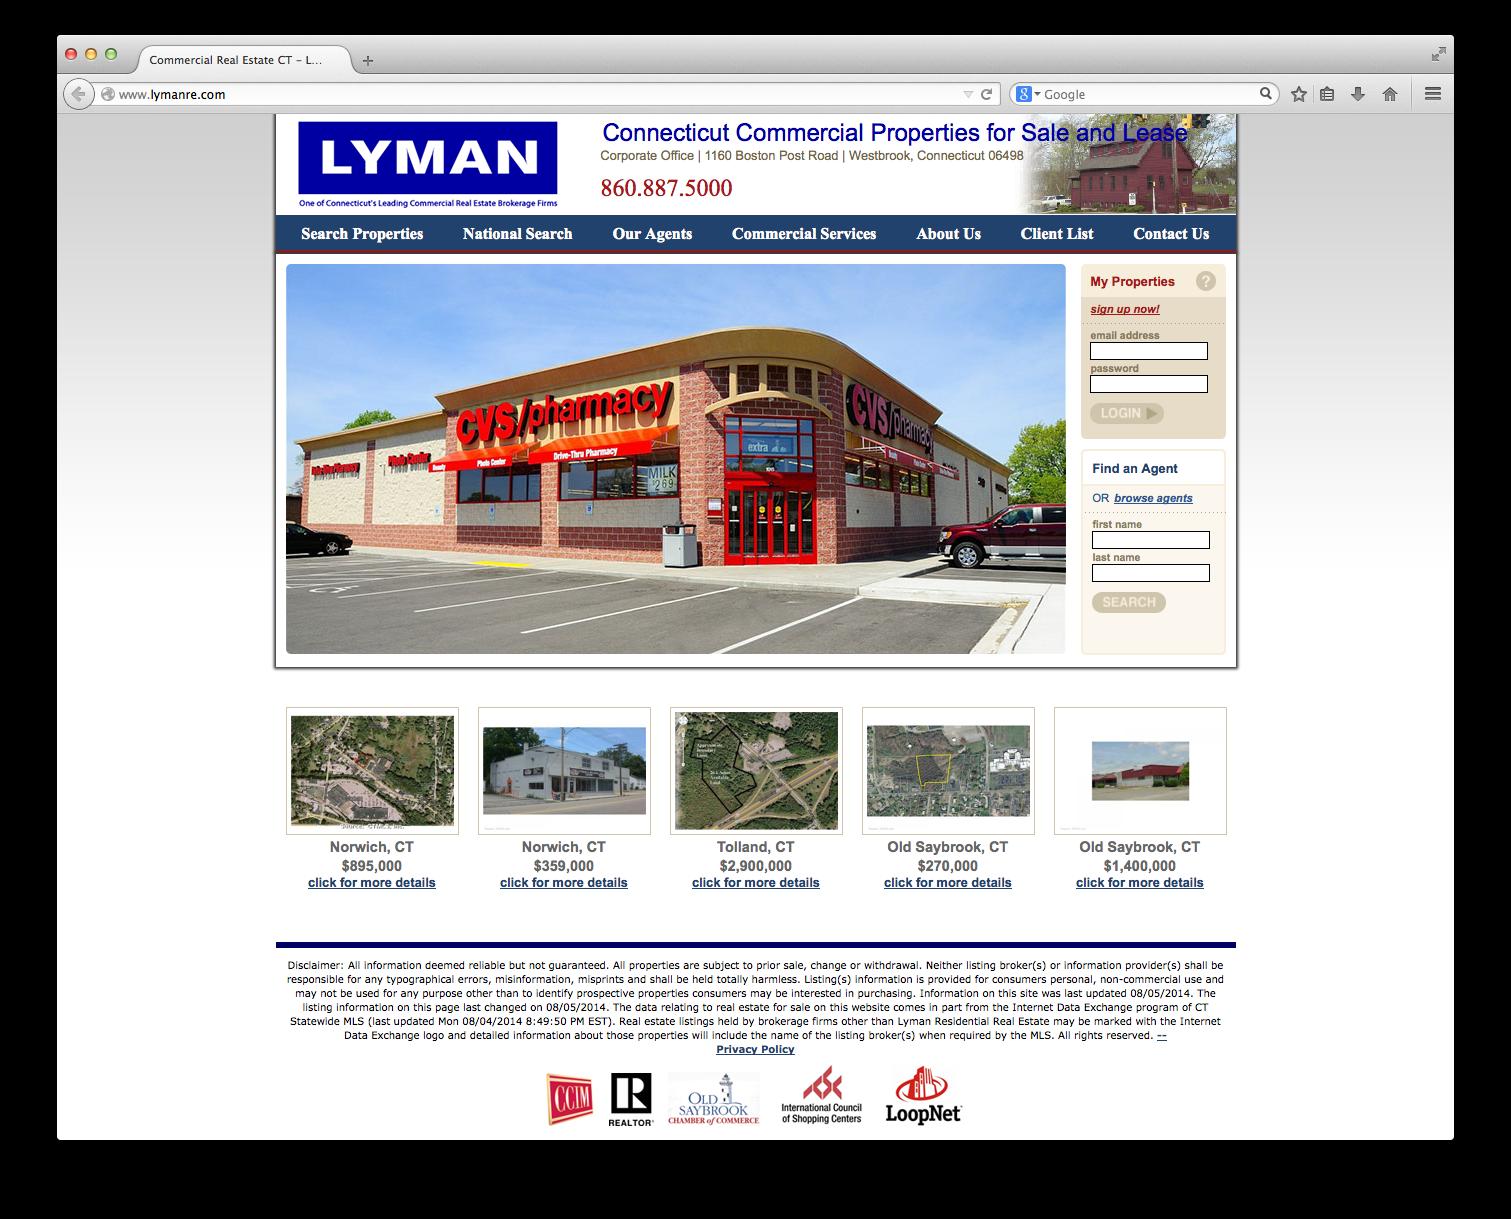 www.lymanre.com